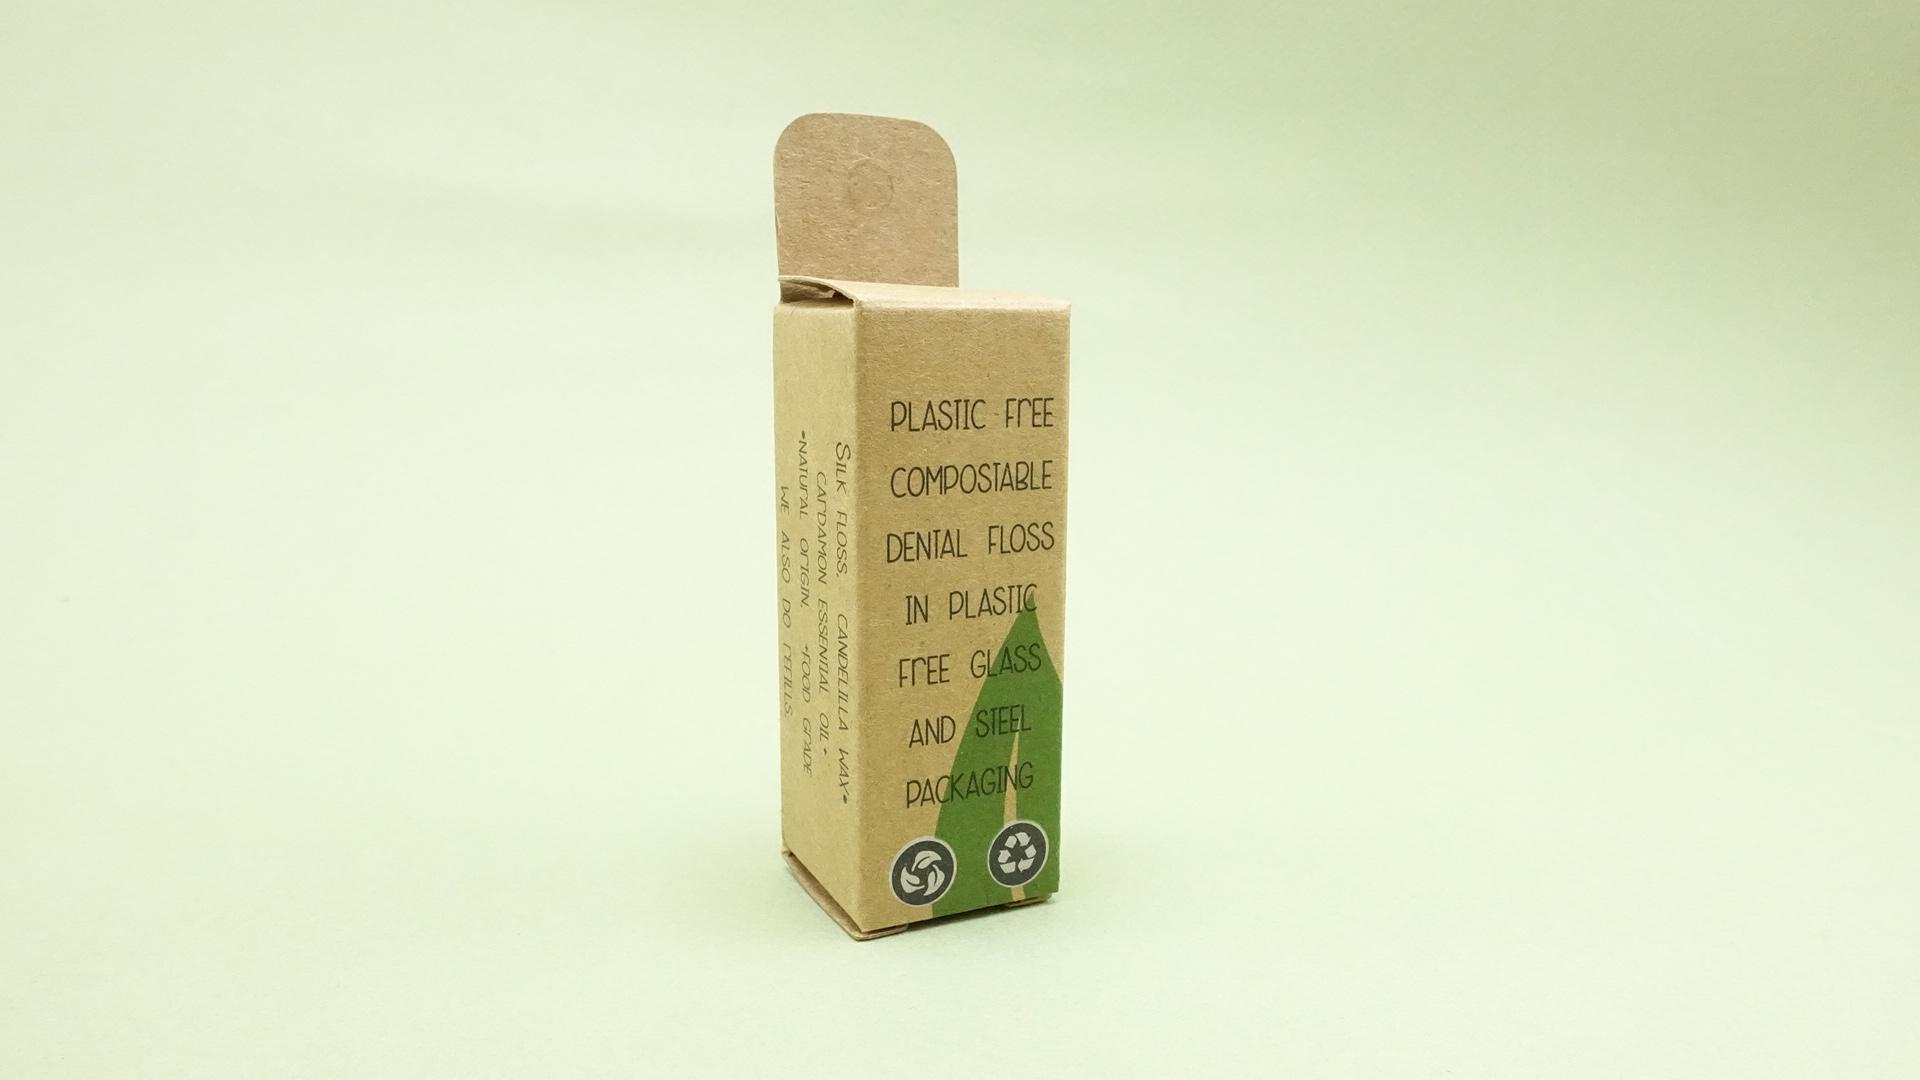 Plastic Free Dental Floss